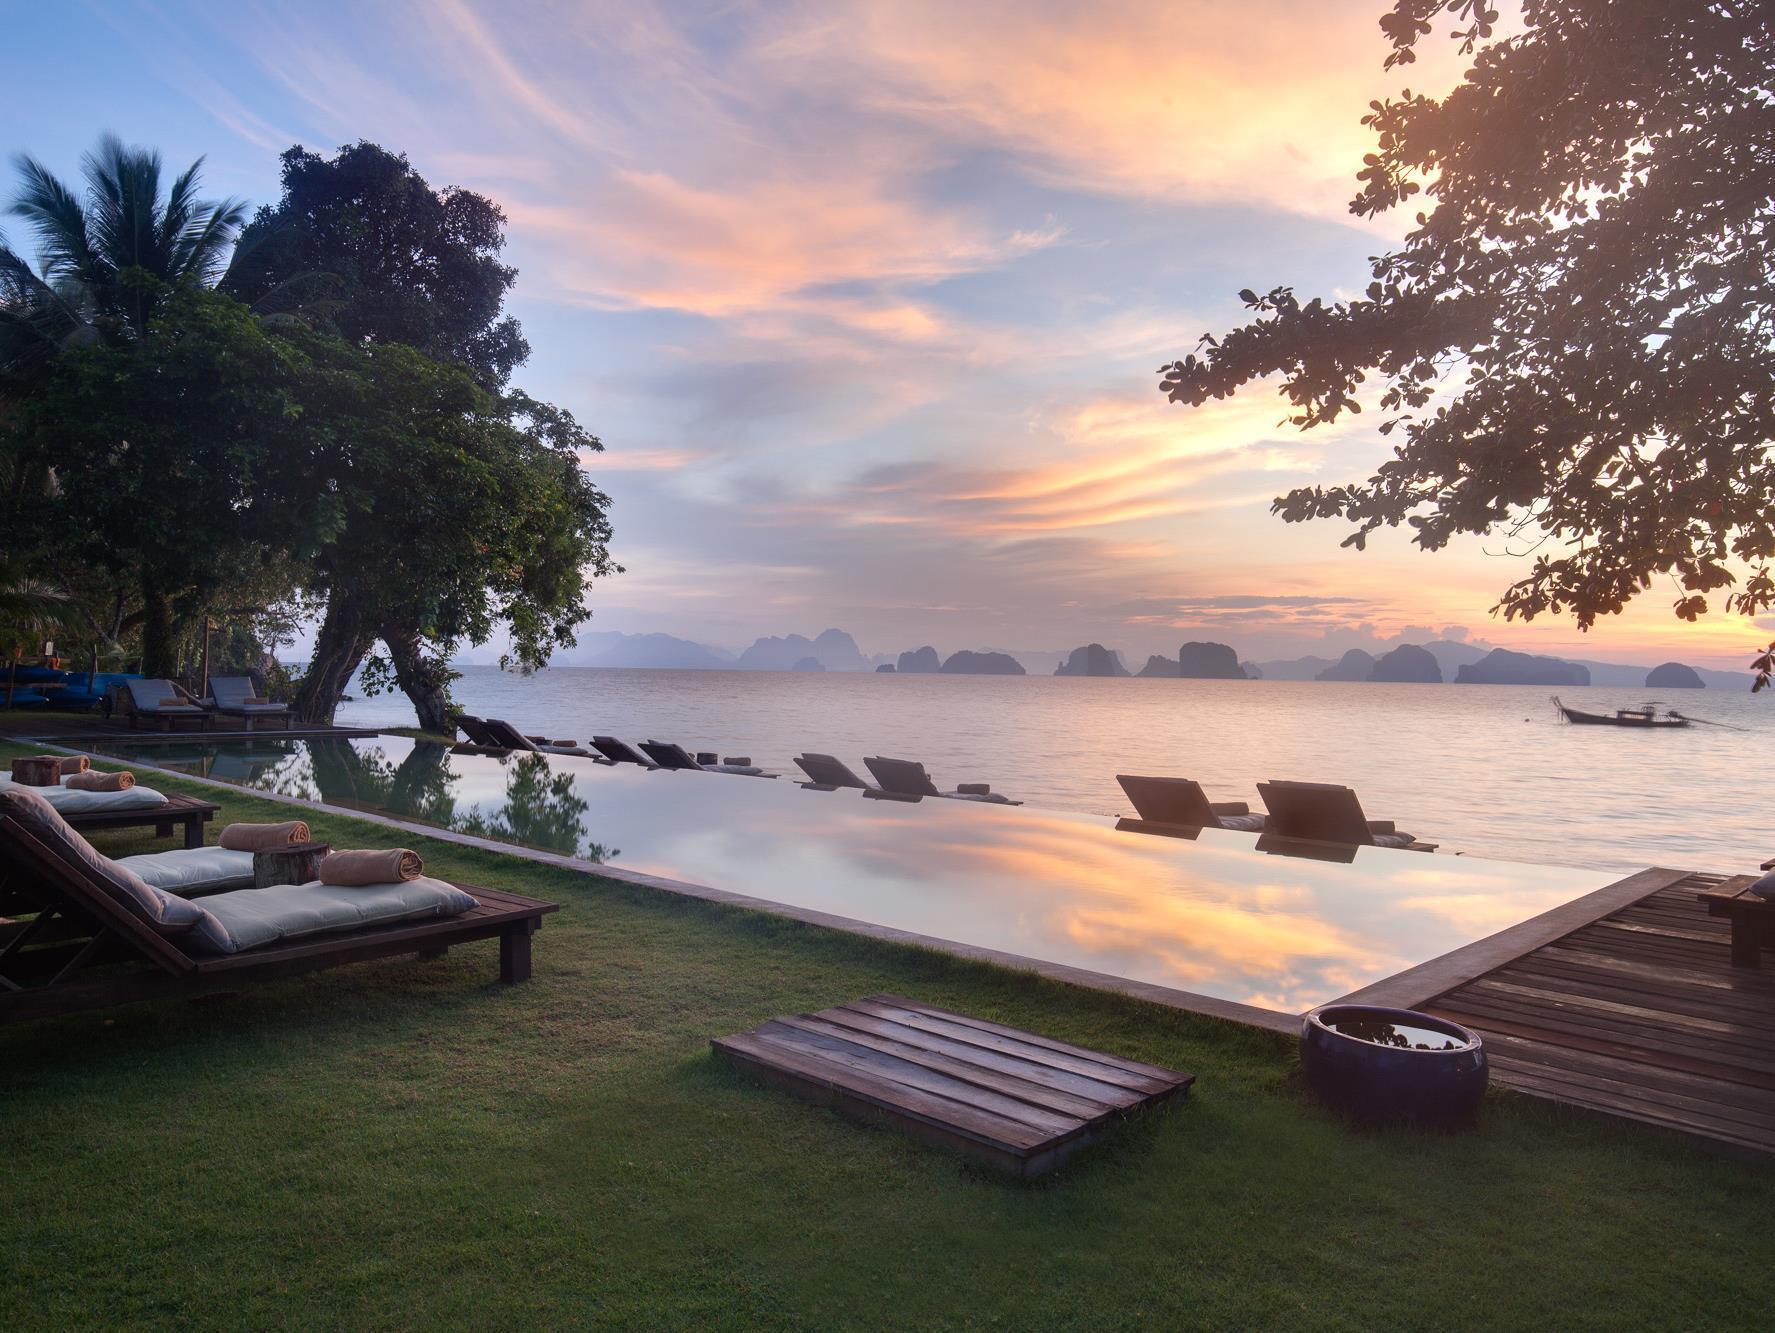 Koyao Island Resort เกาะยาว ไอส์แลนด์ รีสอร์ท